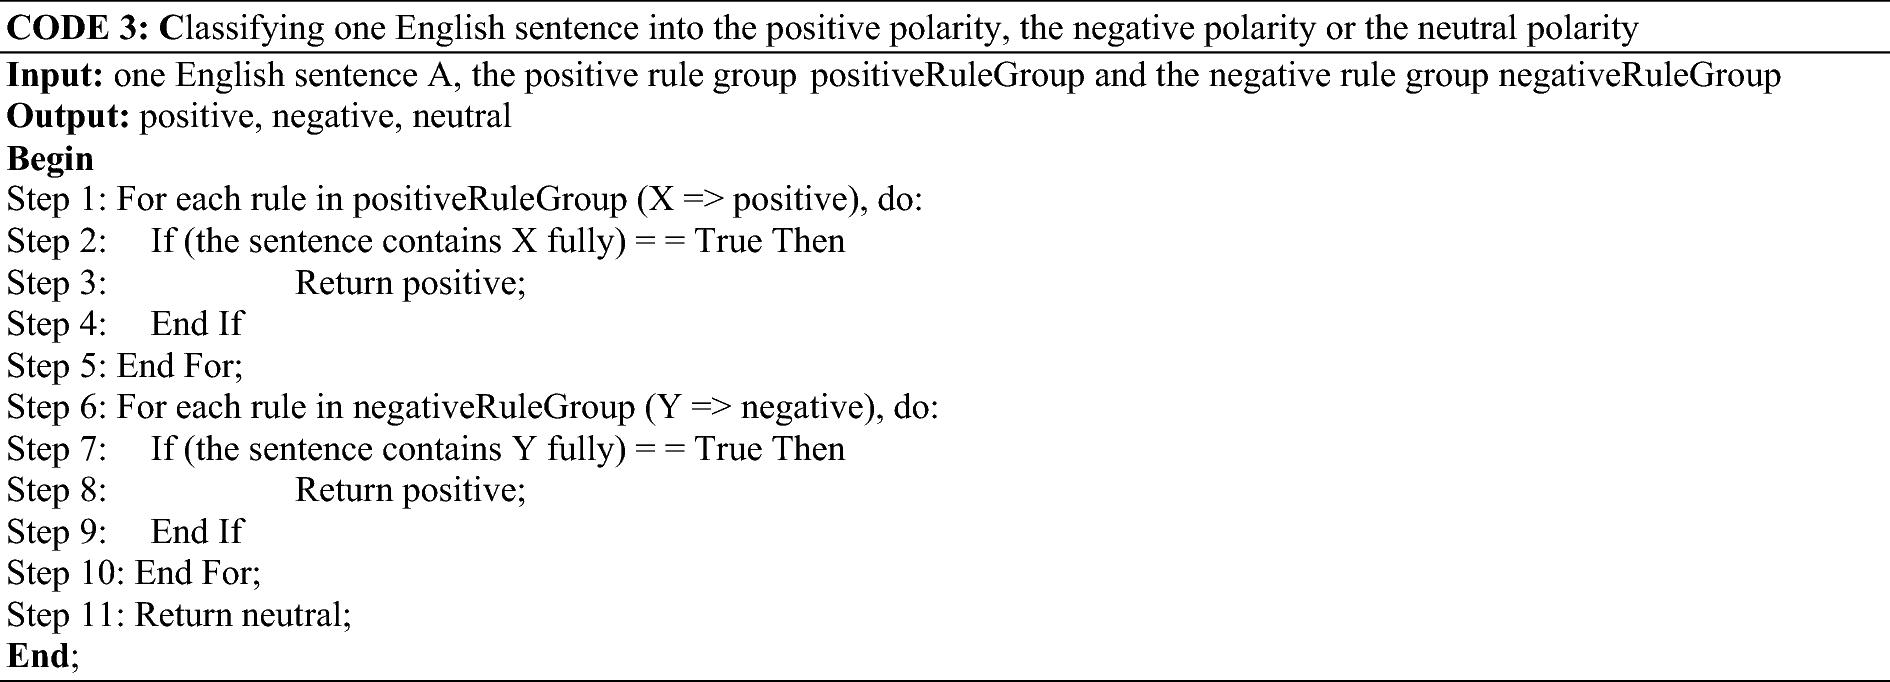 A C4 5 algorithm for english emotional classification